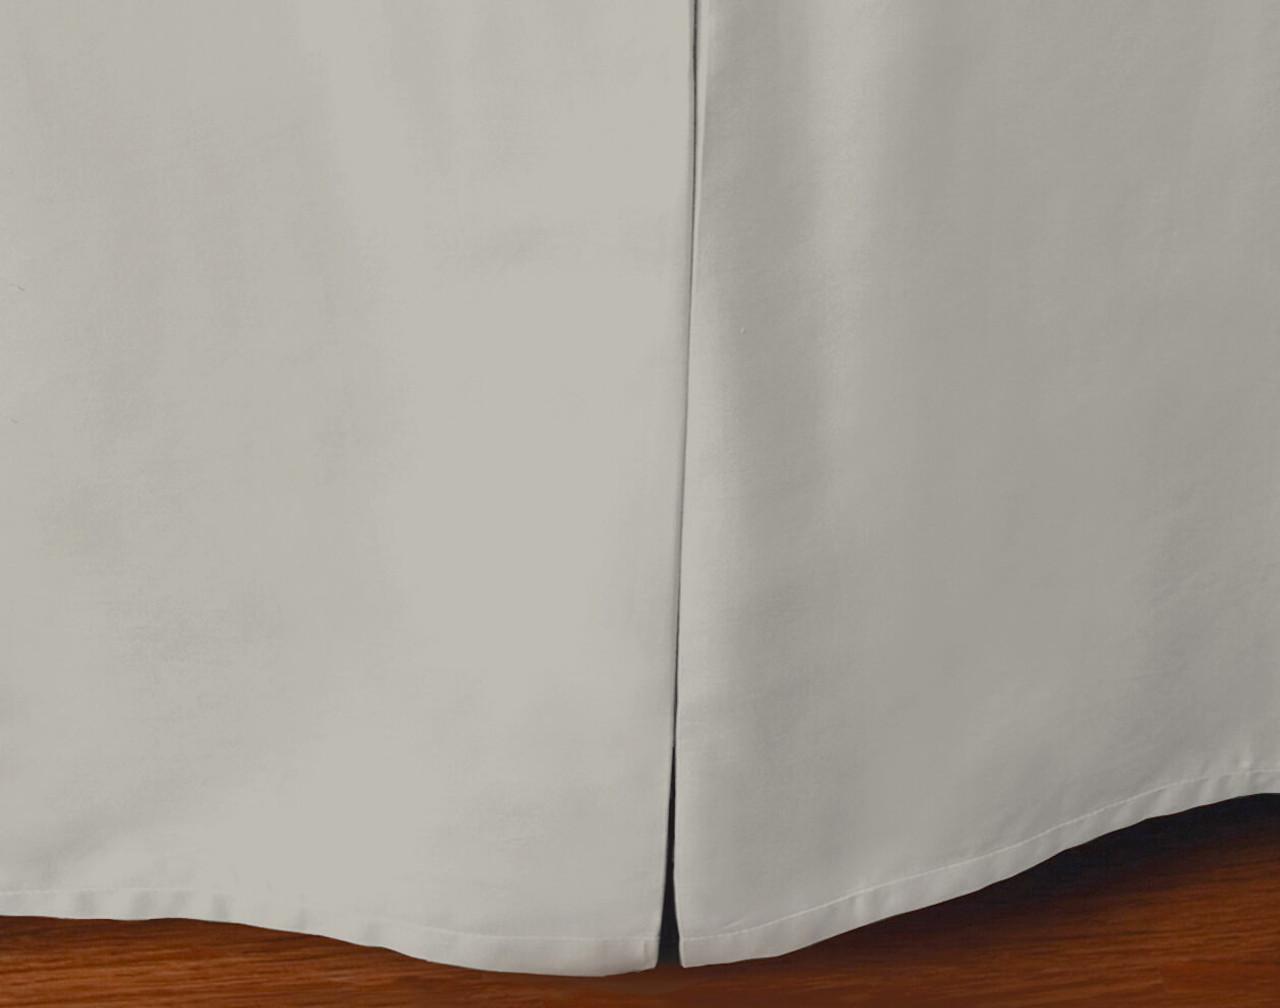 Cotton Blend Bedskirt in Silver.